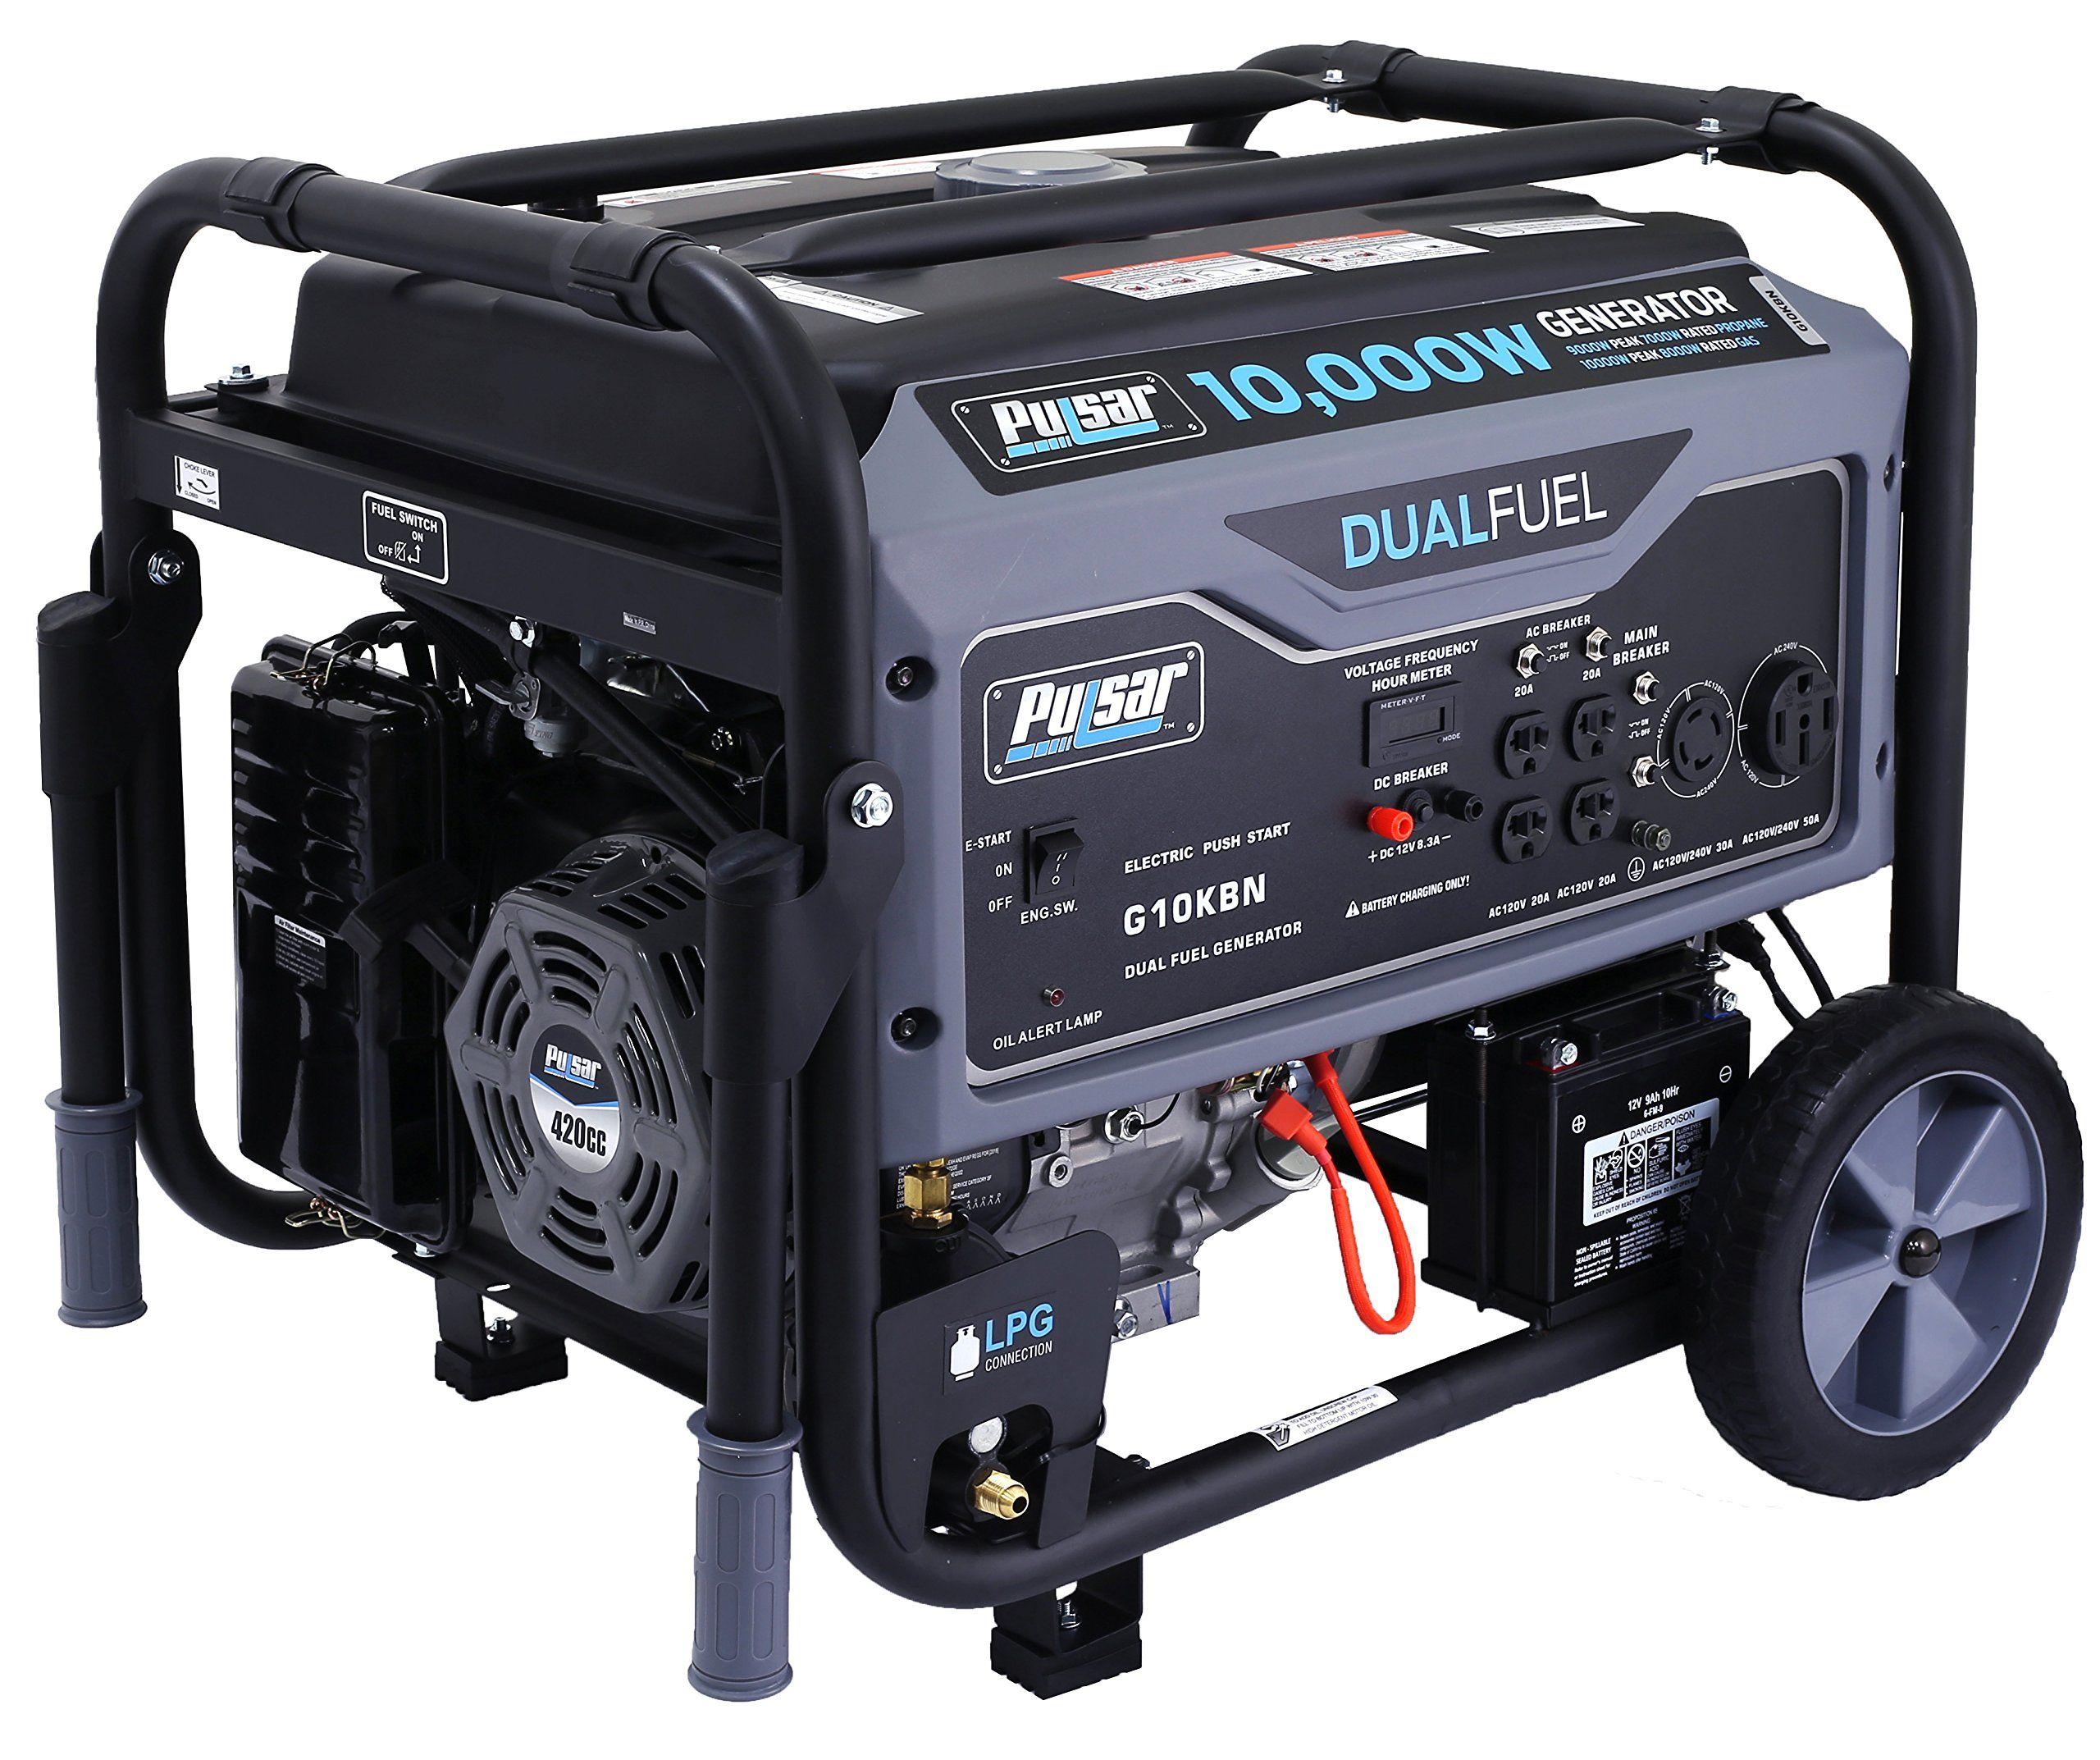 Pulsar 10000W Portable DualFuel Generator with Electric